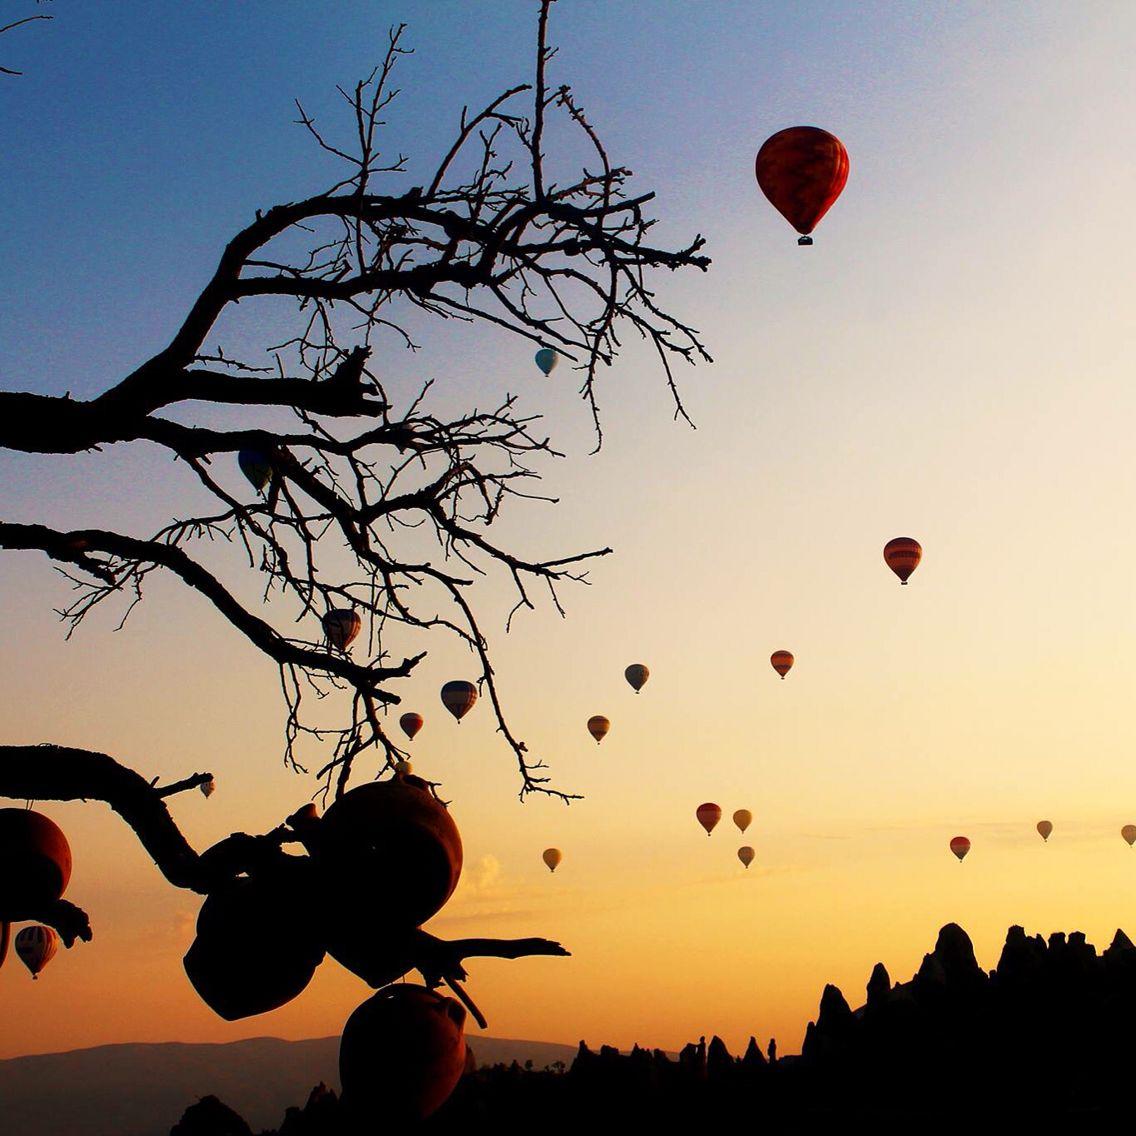 Cappadoccia, Turkey Dance of the balloons